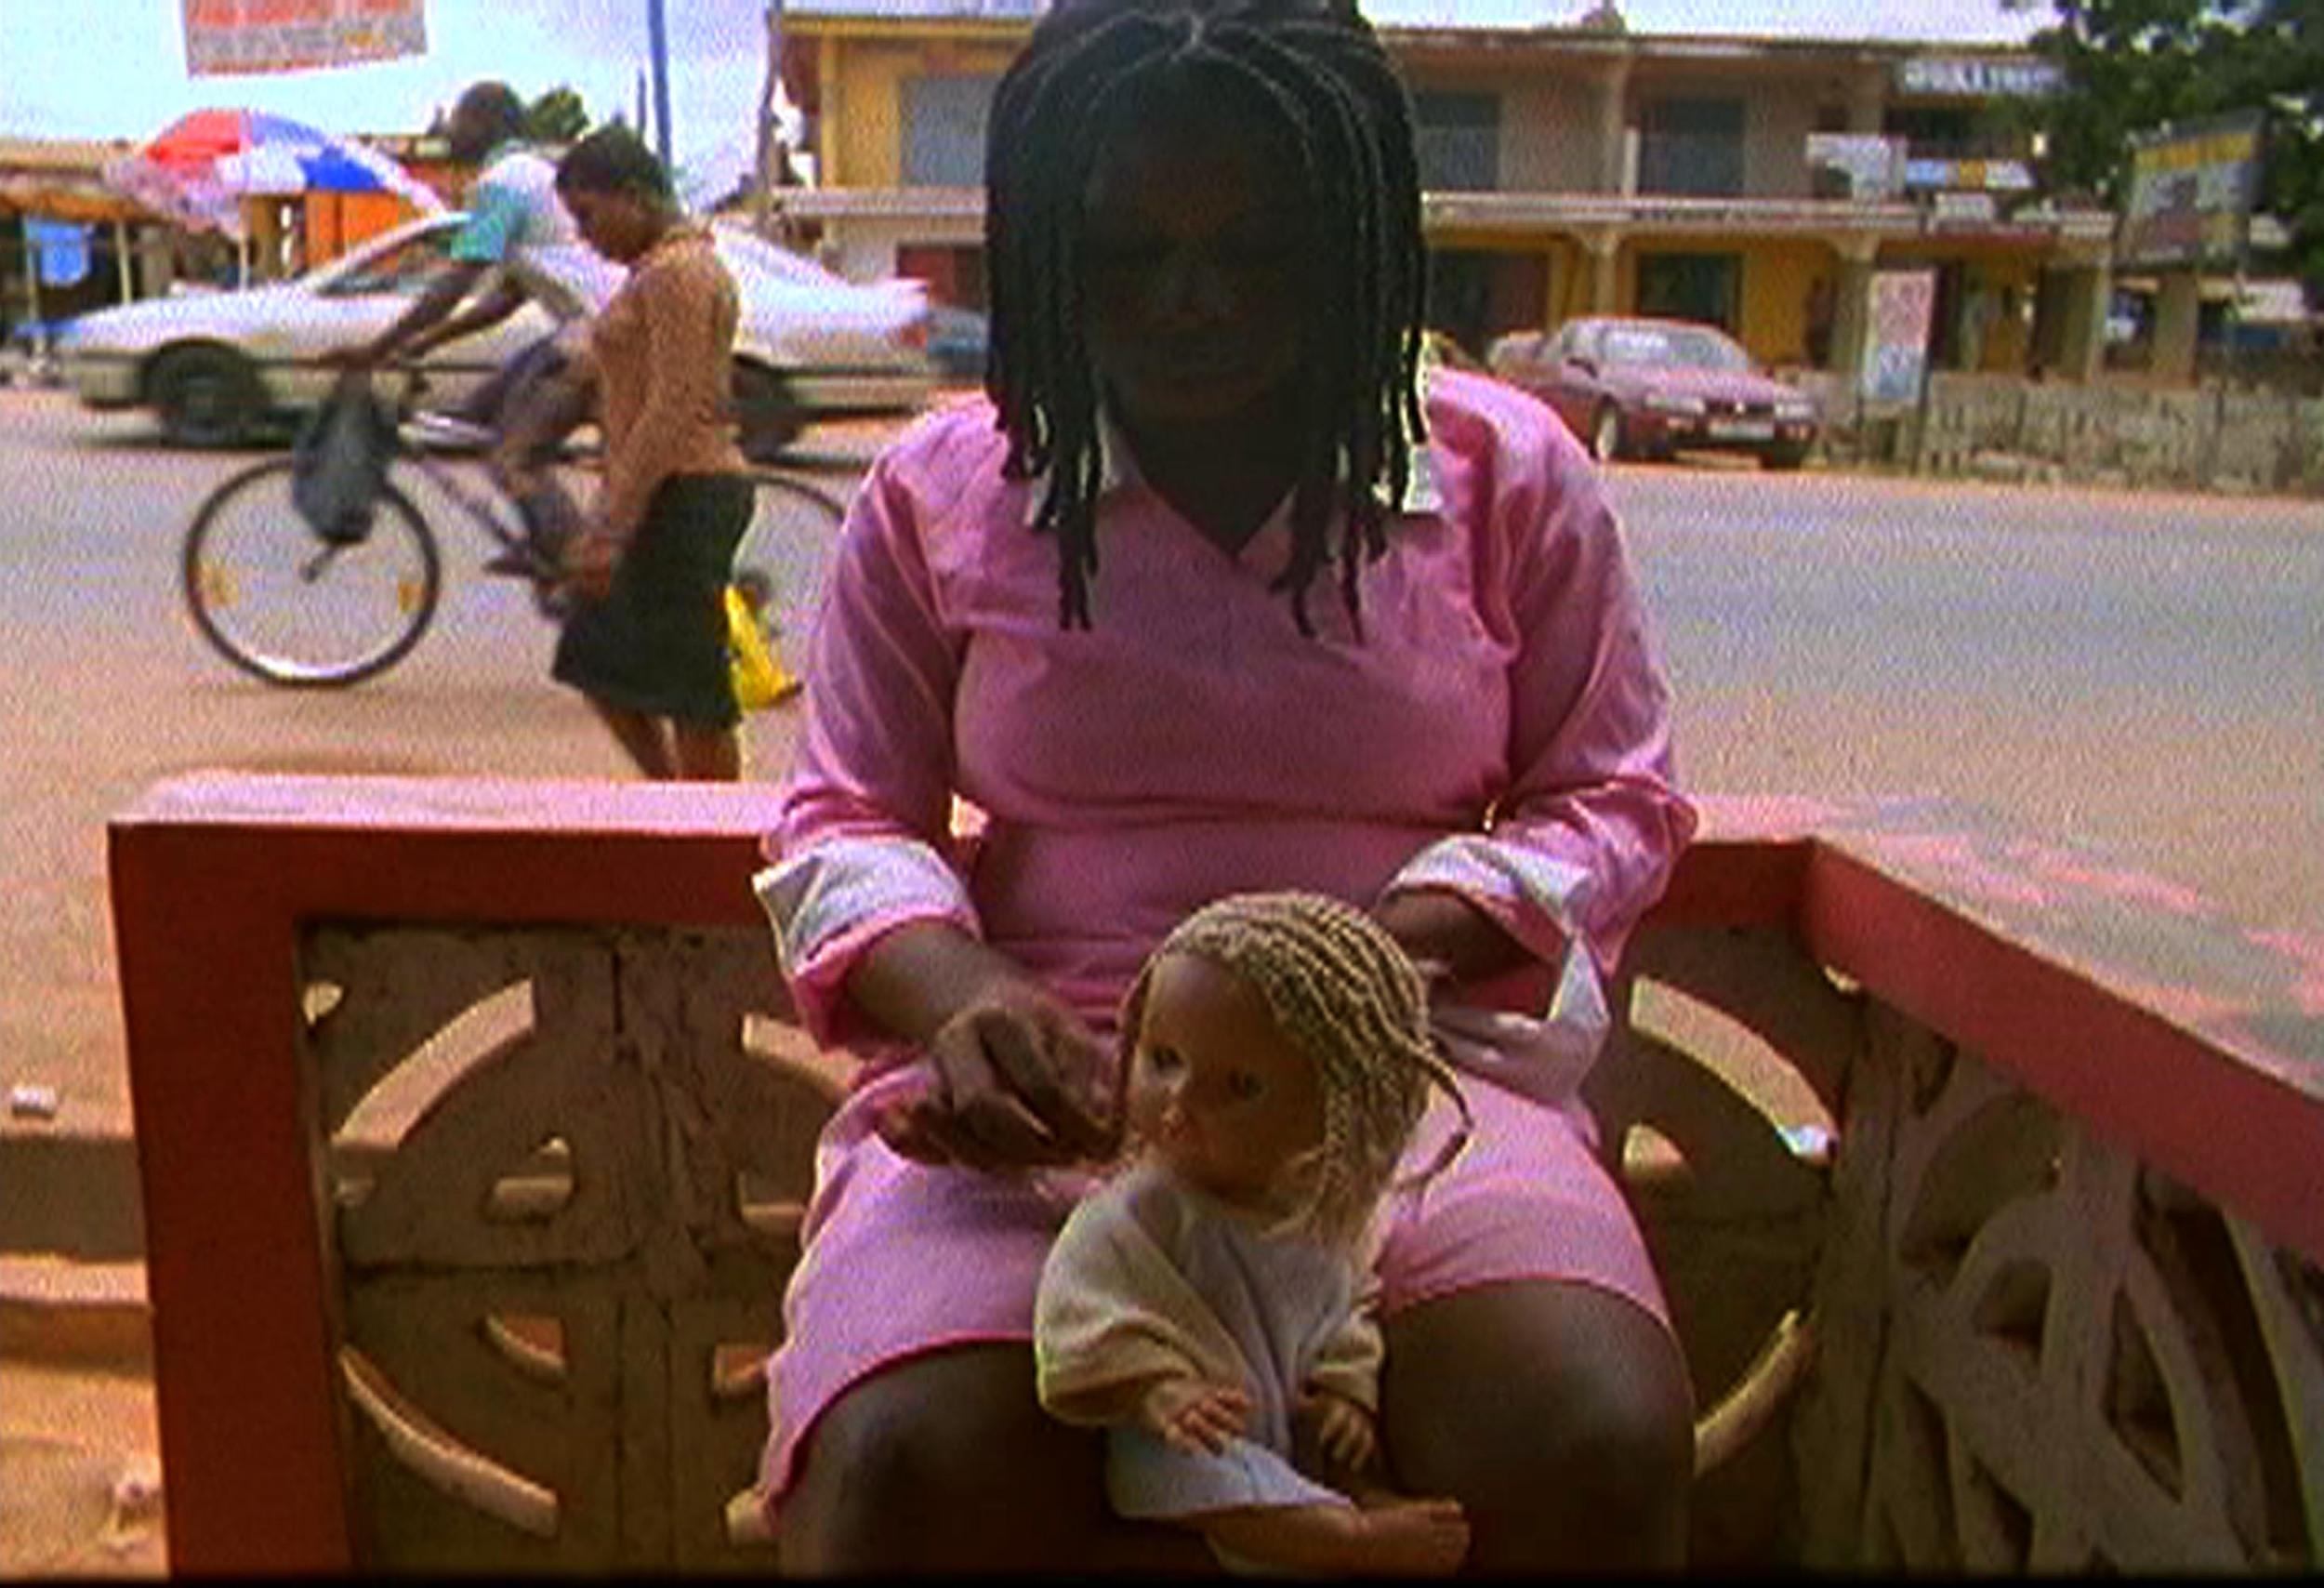 Akosua Adoma Owusu, Me Broni Ba (My White Baby) , 2009, 16 mm film and digital video.